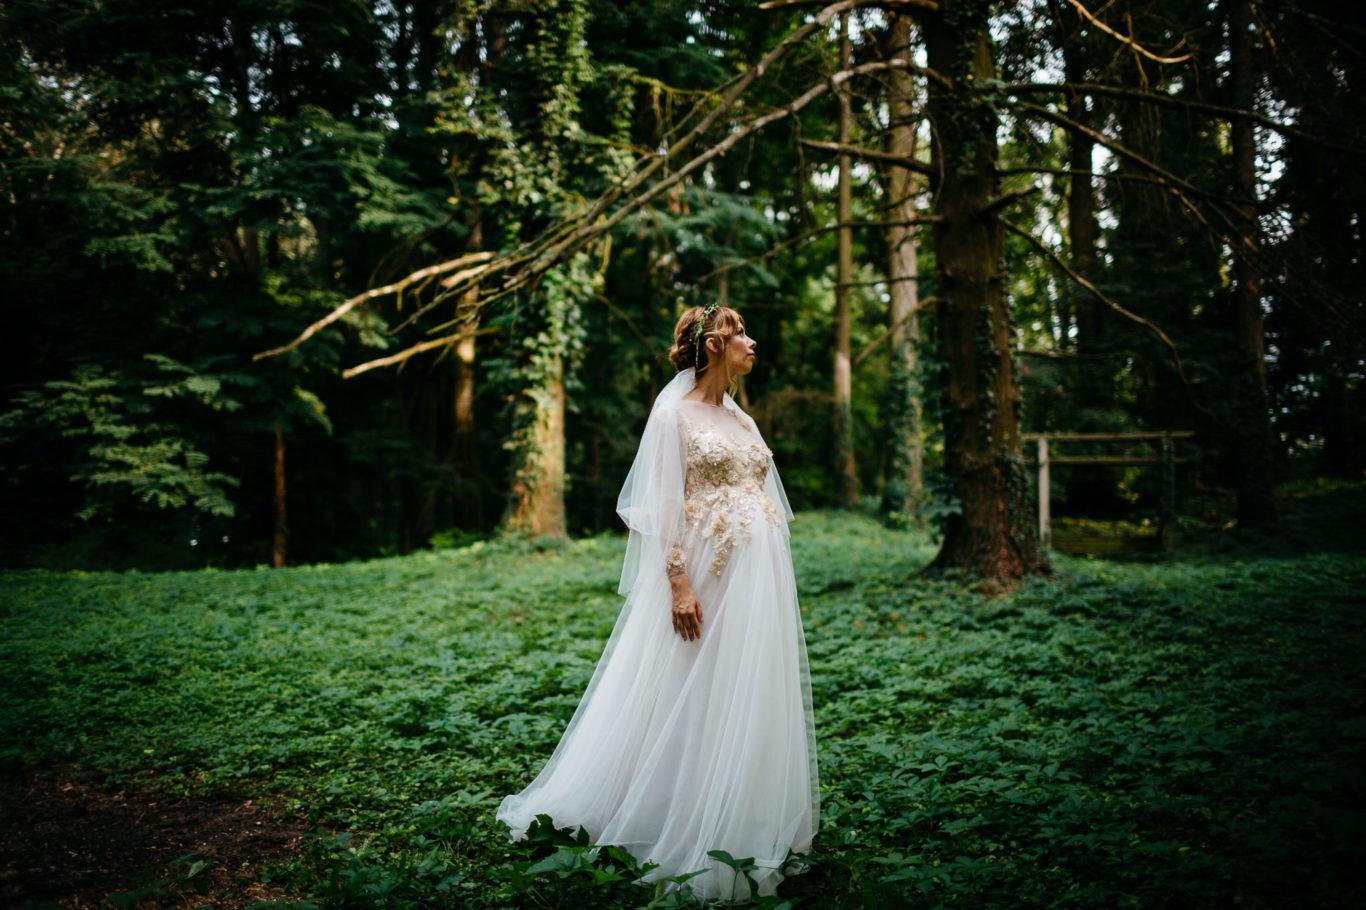 0191-Fotografie-nunta-Stirbey-Laura-Rares-fotograf-Ciprian-Dumitrescu-CDF_0194 (2)